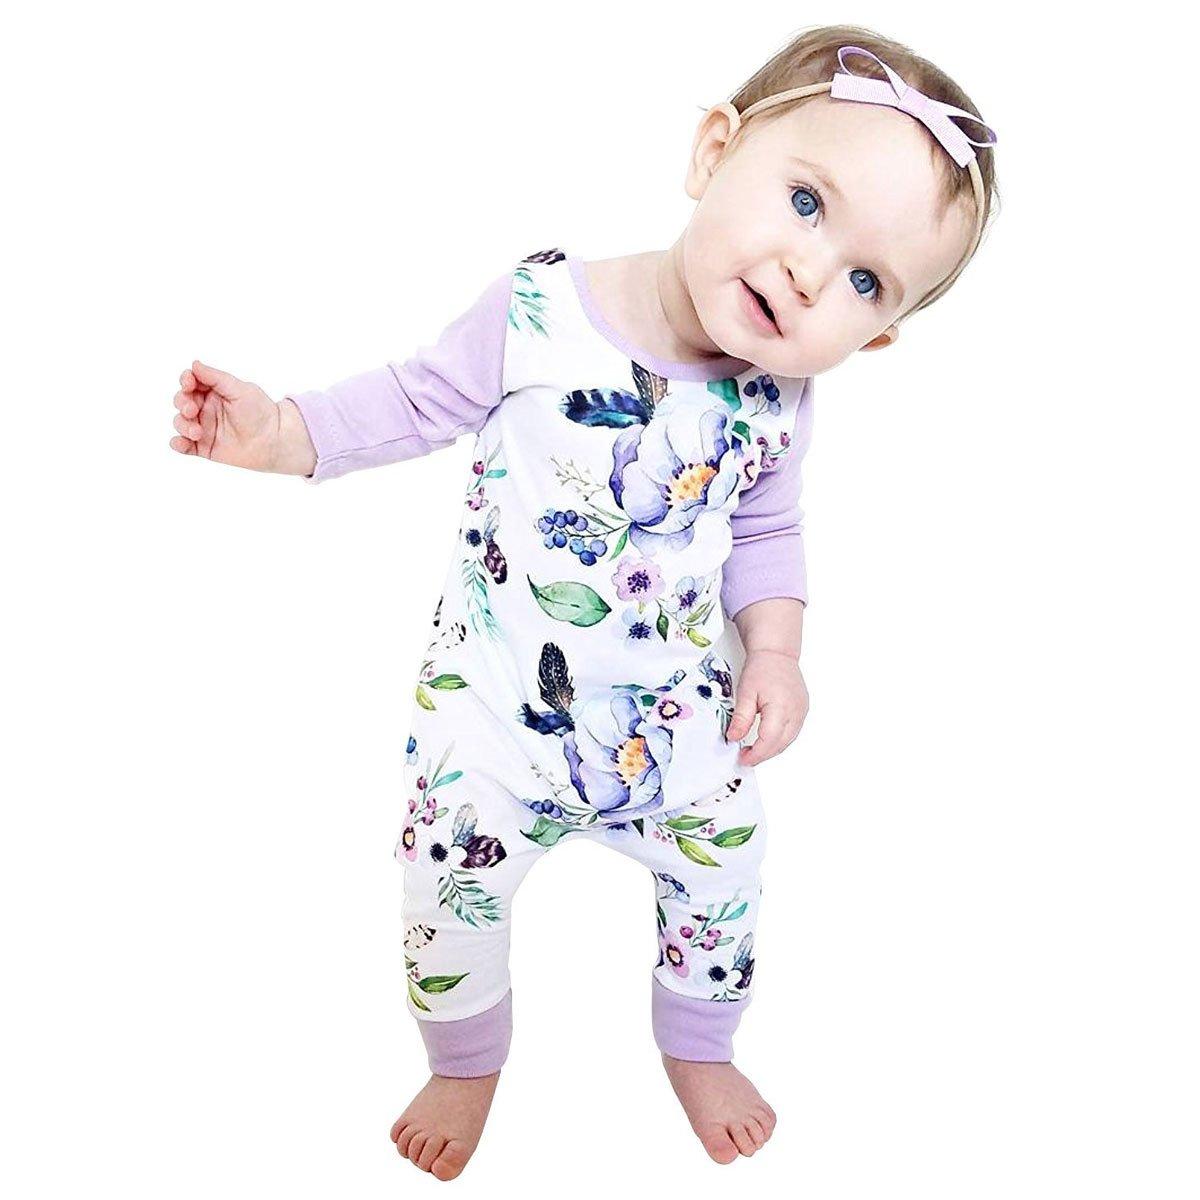 Newborn Baby Girls Floral Print Long Sleeve Bodysuit Romper Jumpsuit Playsuit Outfit Clothes Set